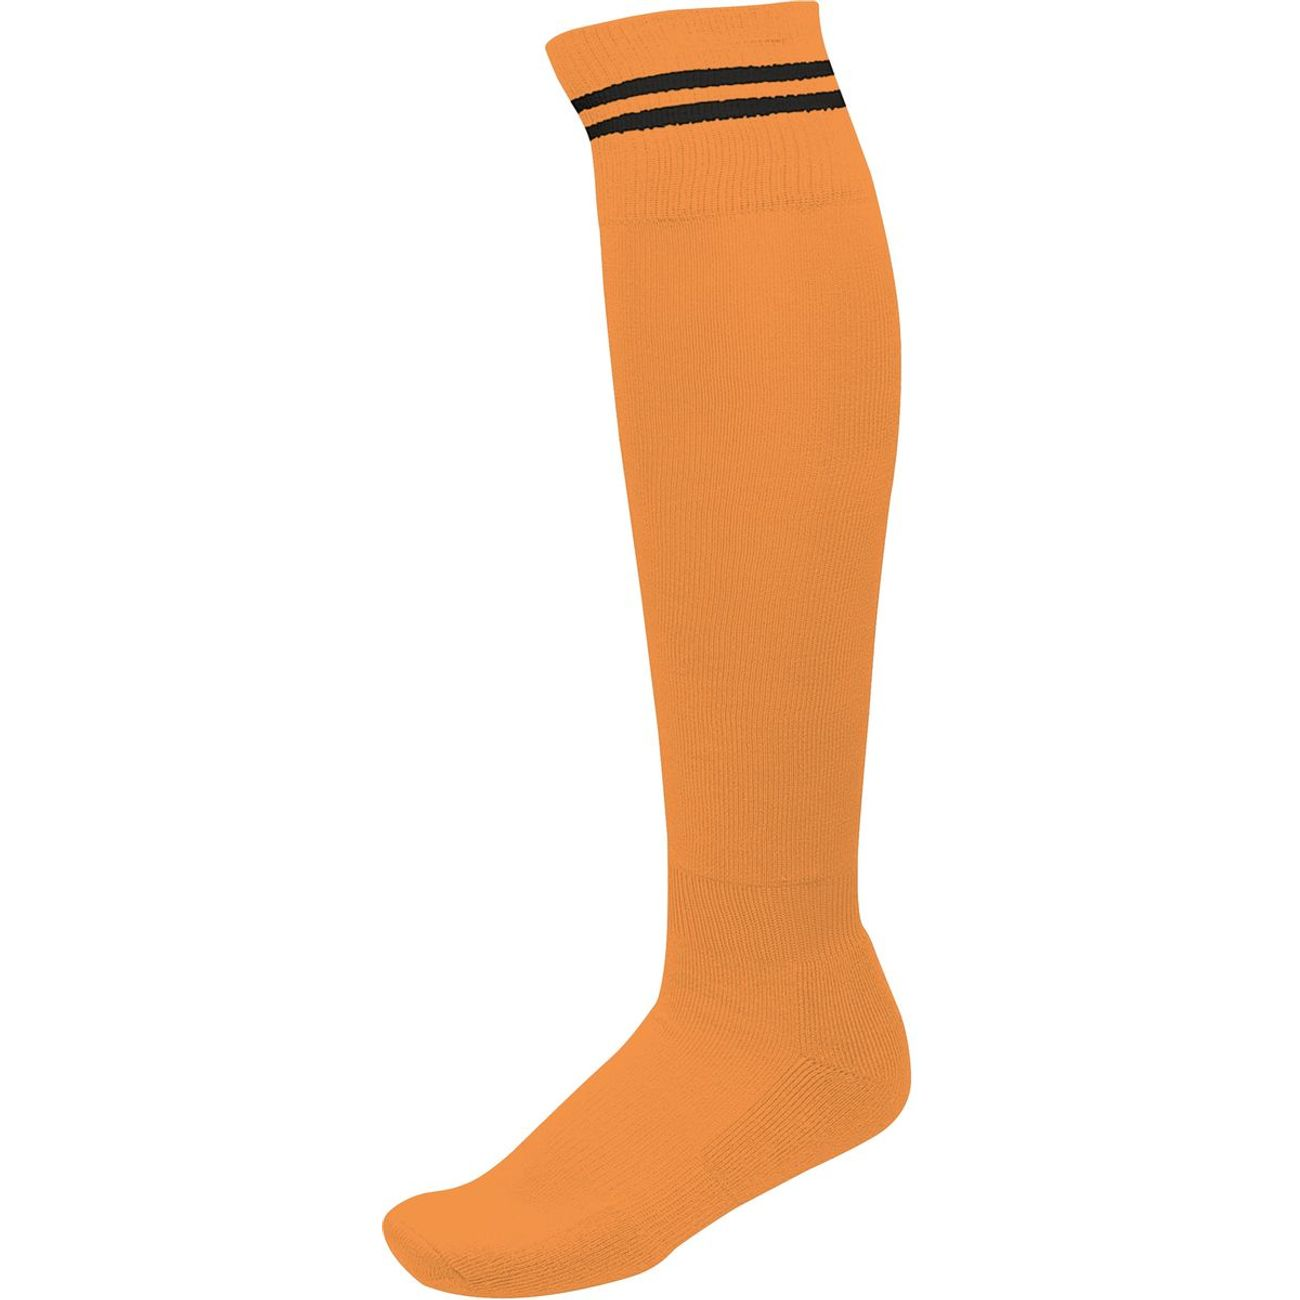 SportPa015 Football Rayure Homme Orange Noir Proact Chaussettes SUVpzM